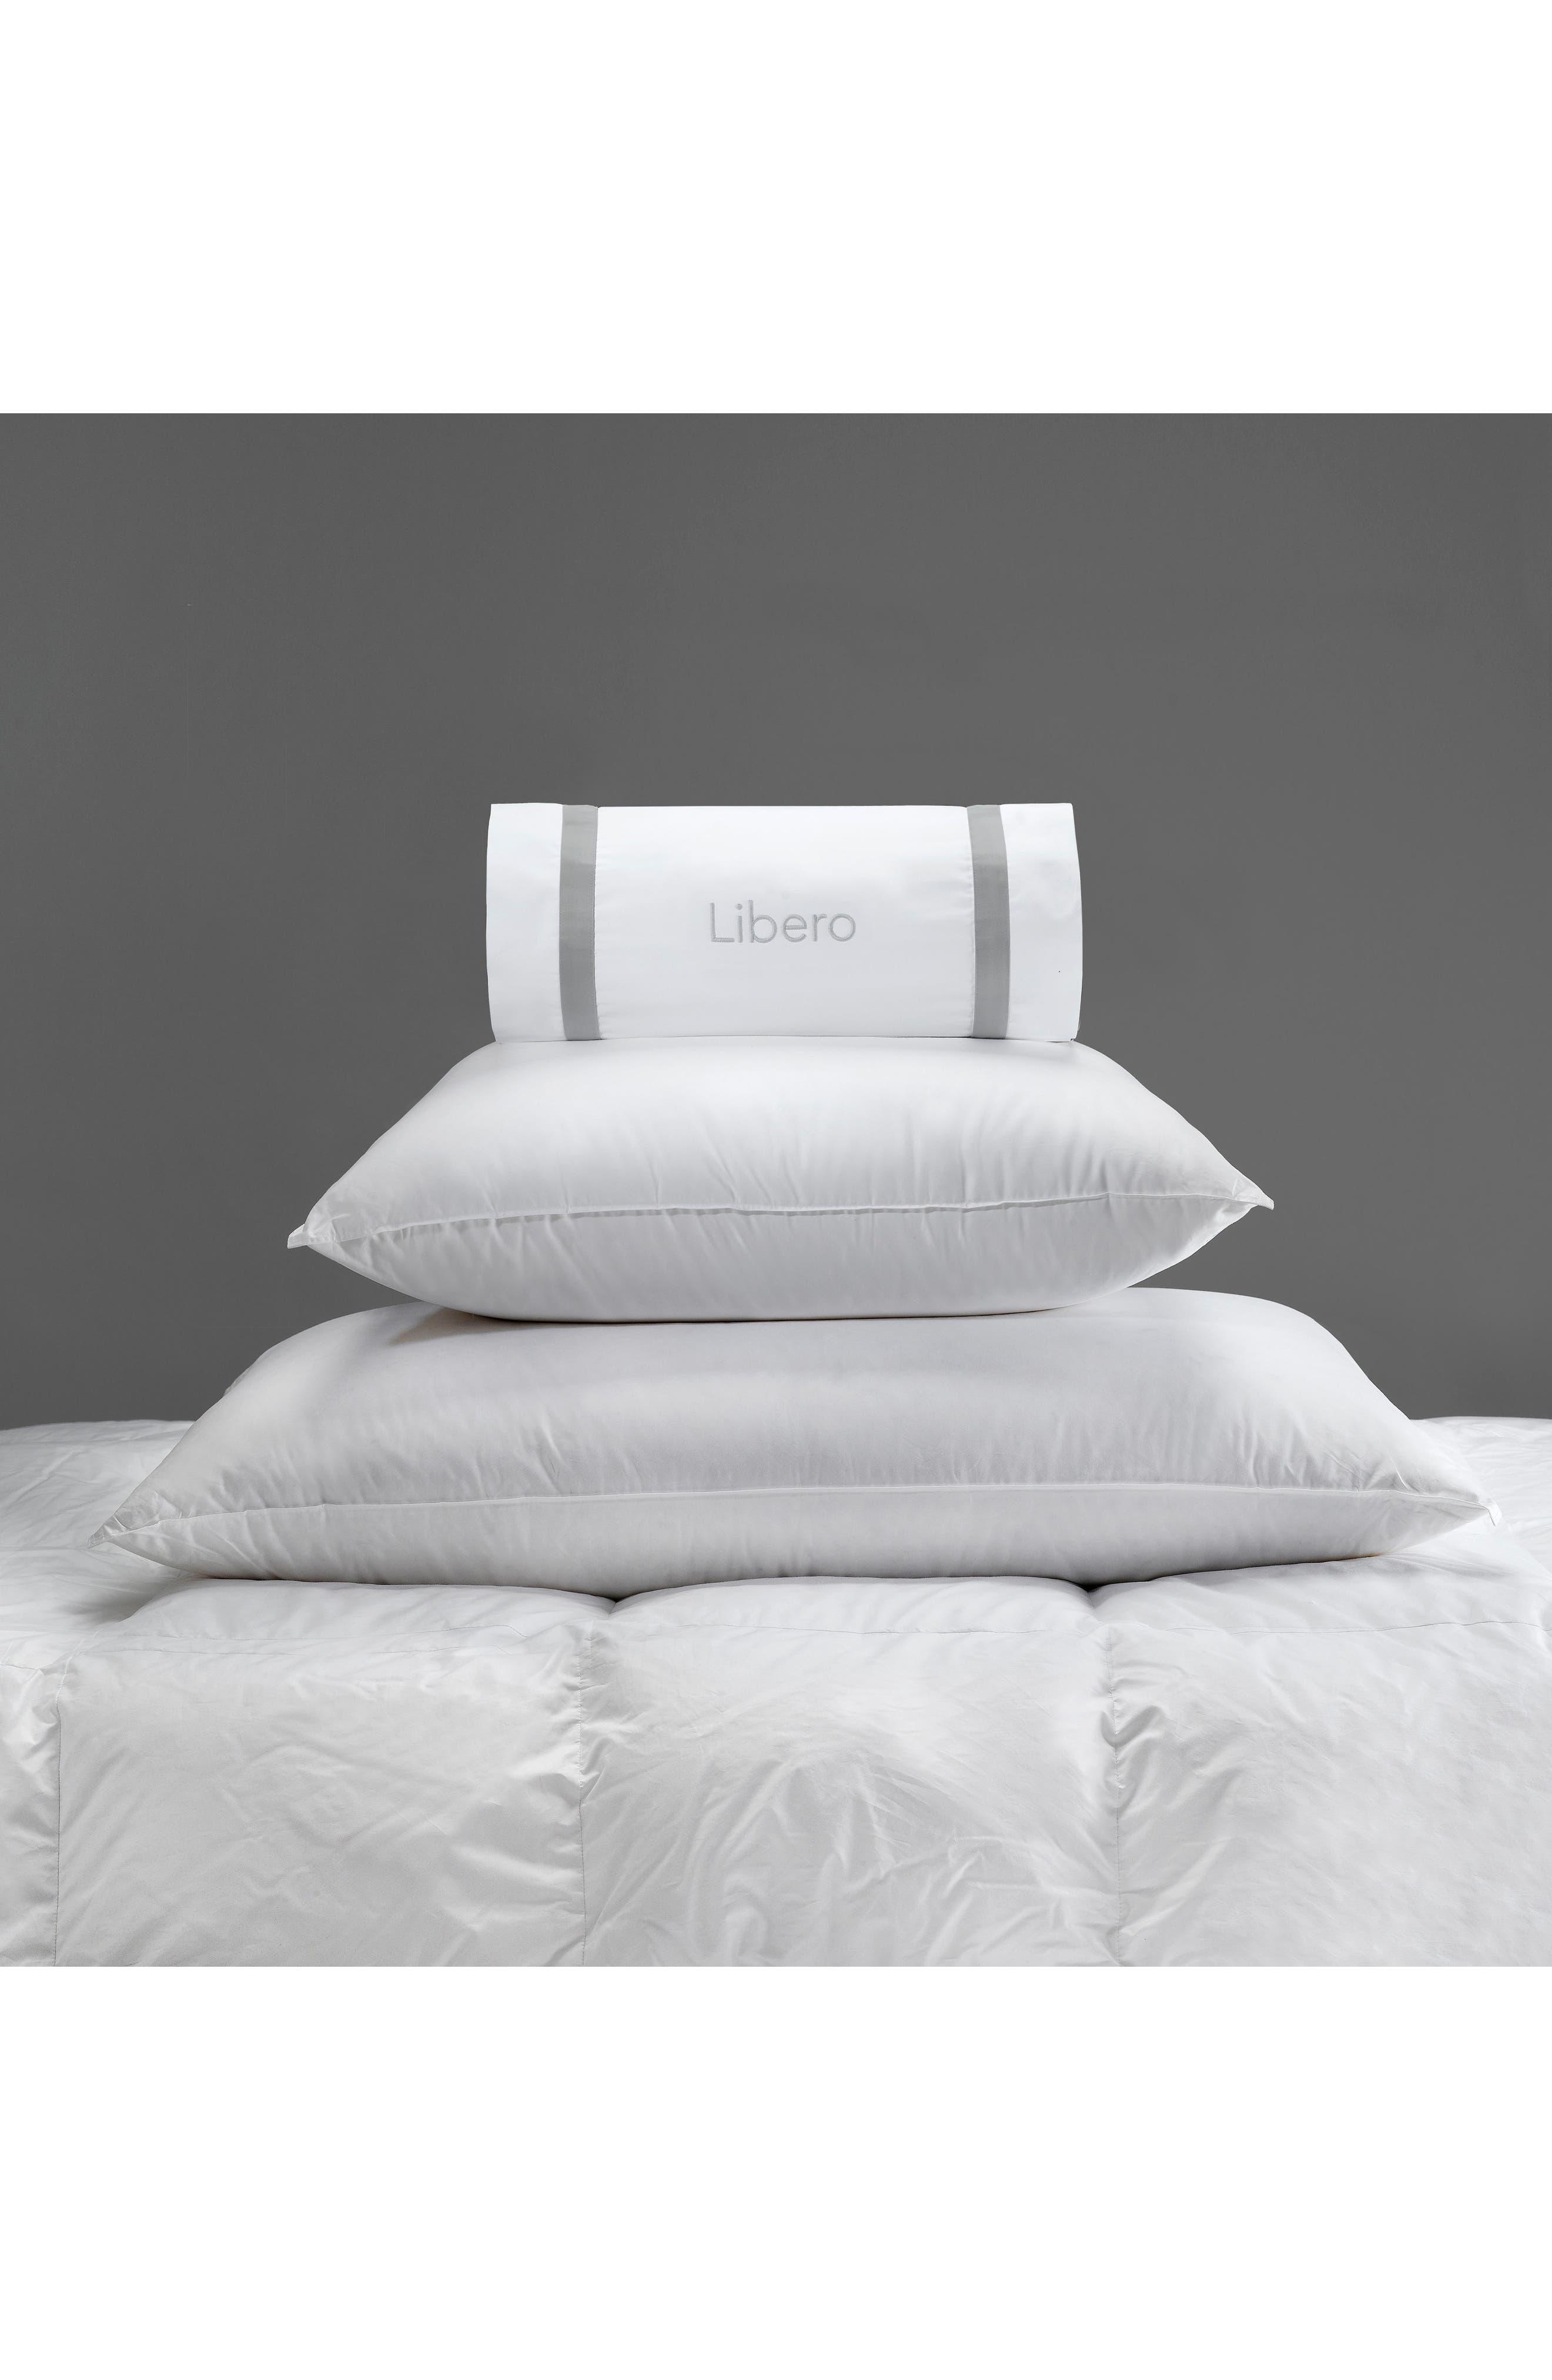 Libero 280 Thread Count Medium Firm Pillow,                             Alternate thumbnail 2, color,                             White